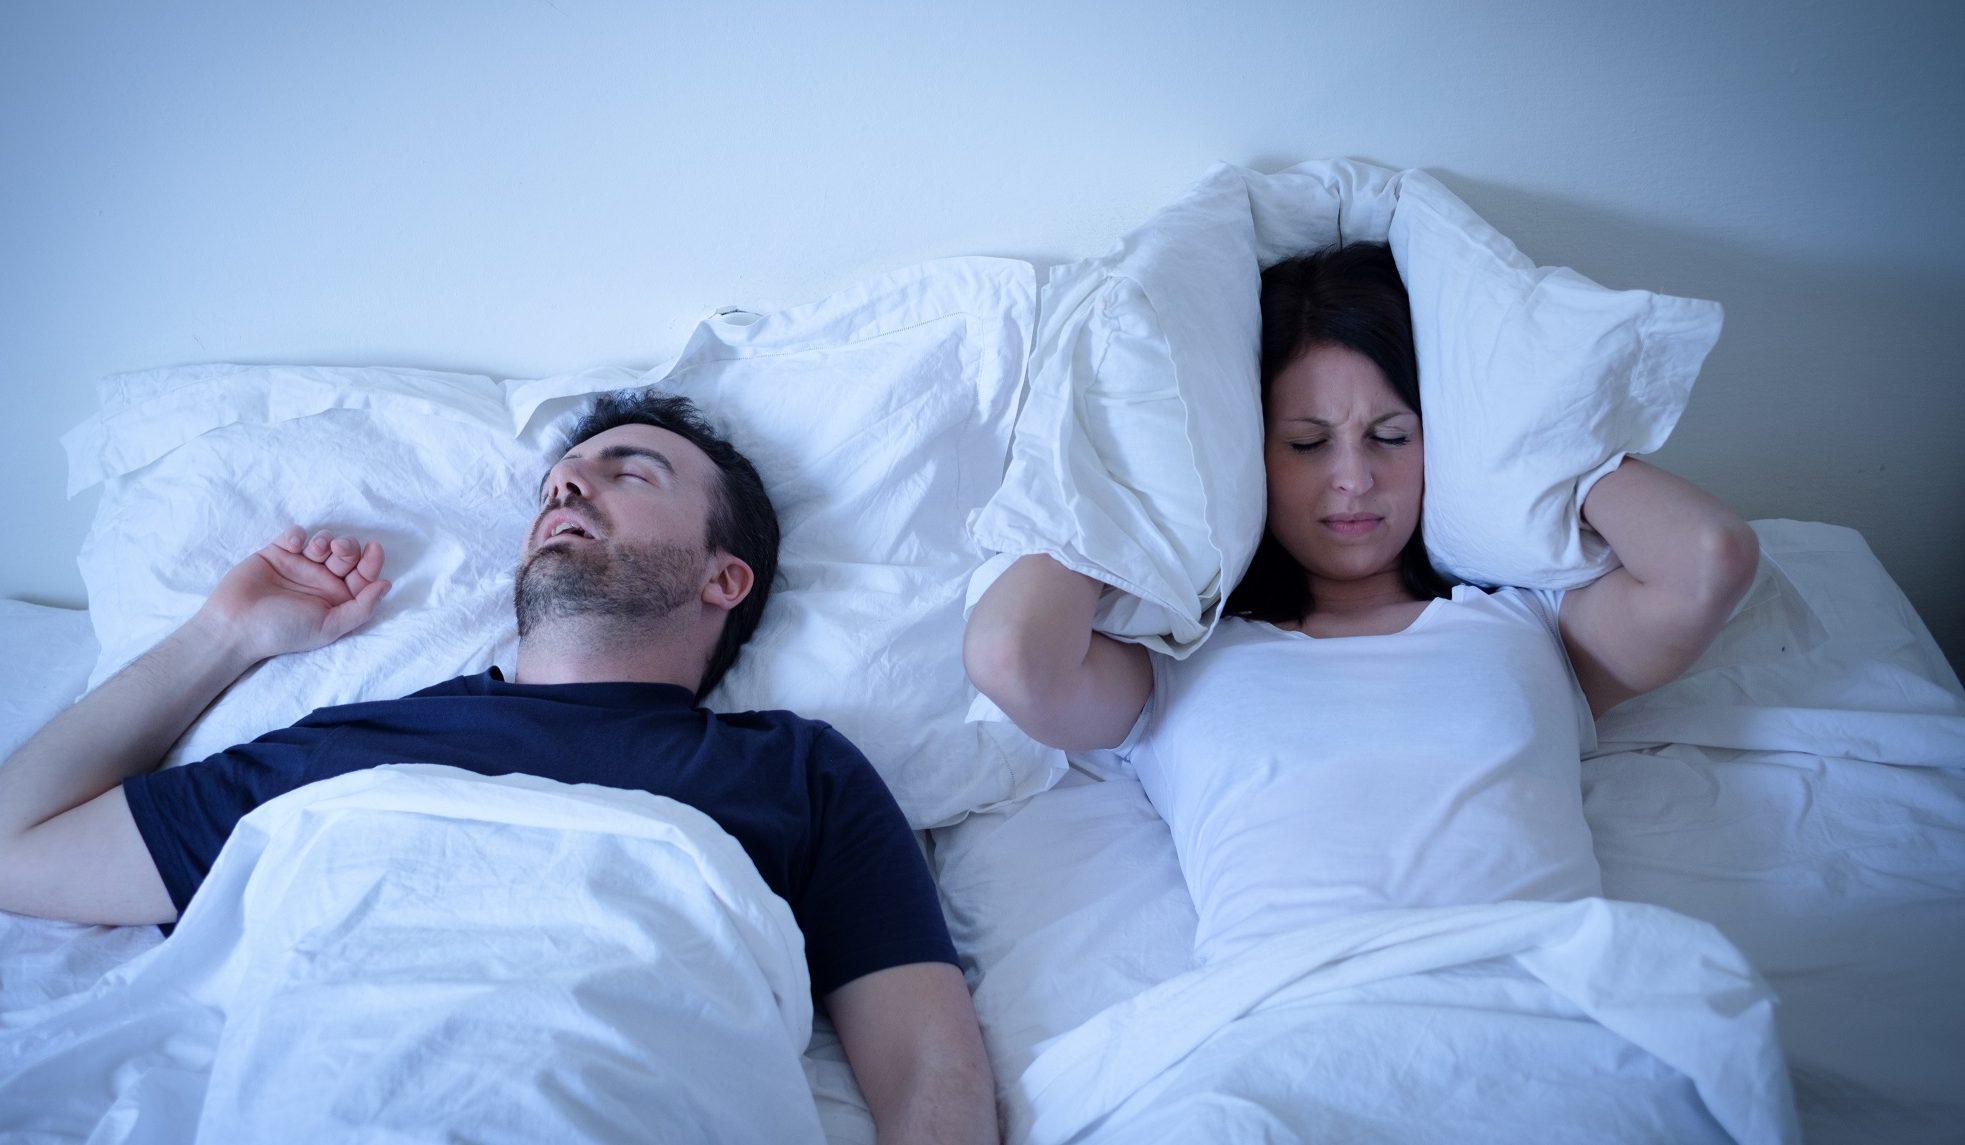 snoring and sleep apnoea